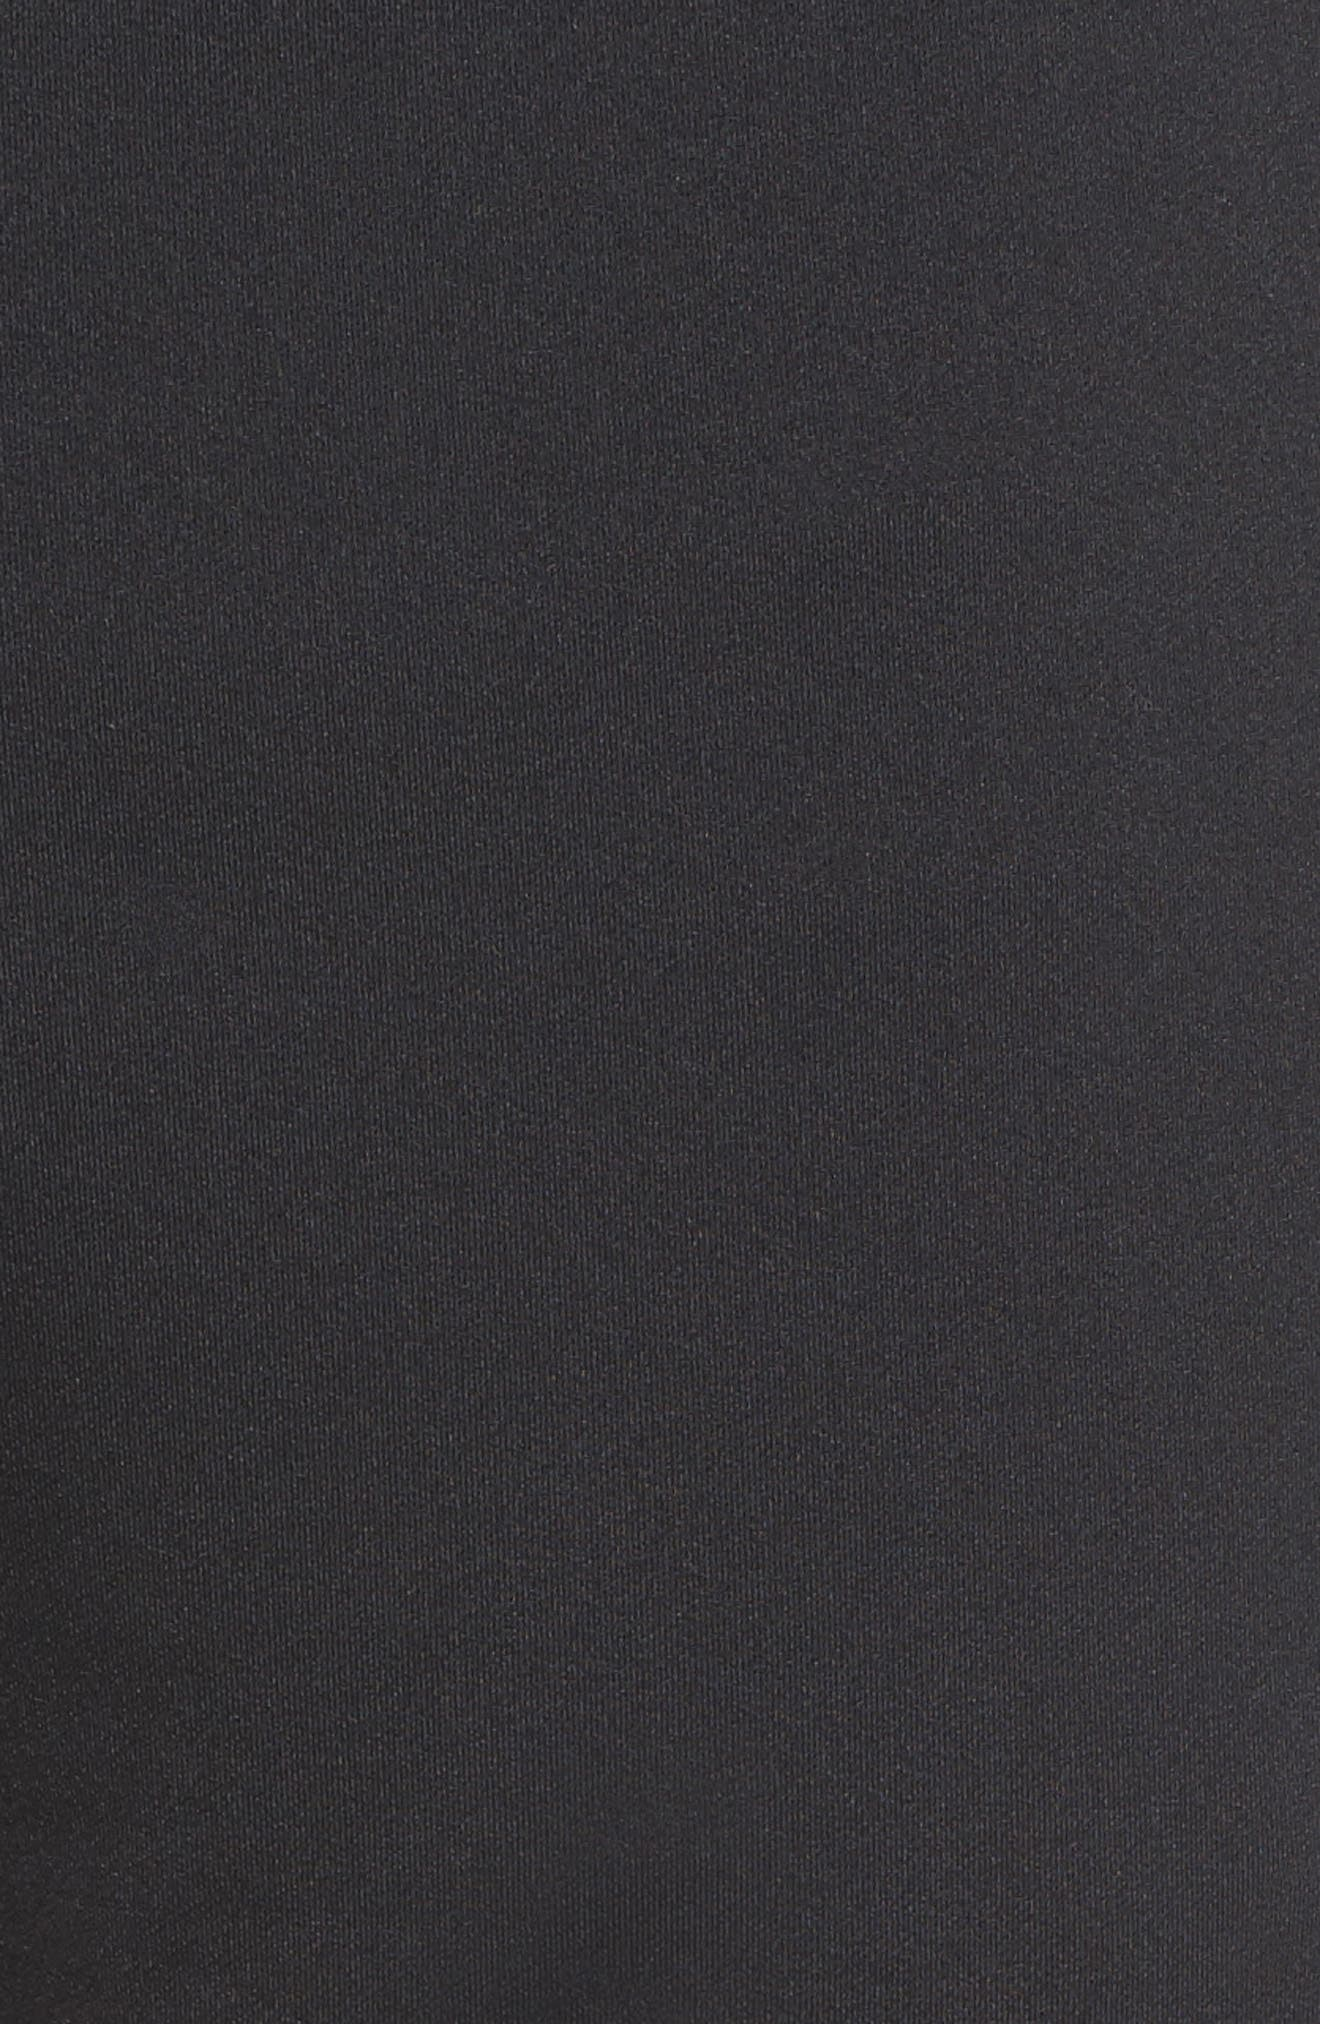 Dry Running Pants,                             Alternate thumbnail 5, color,                             Black